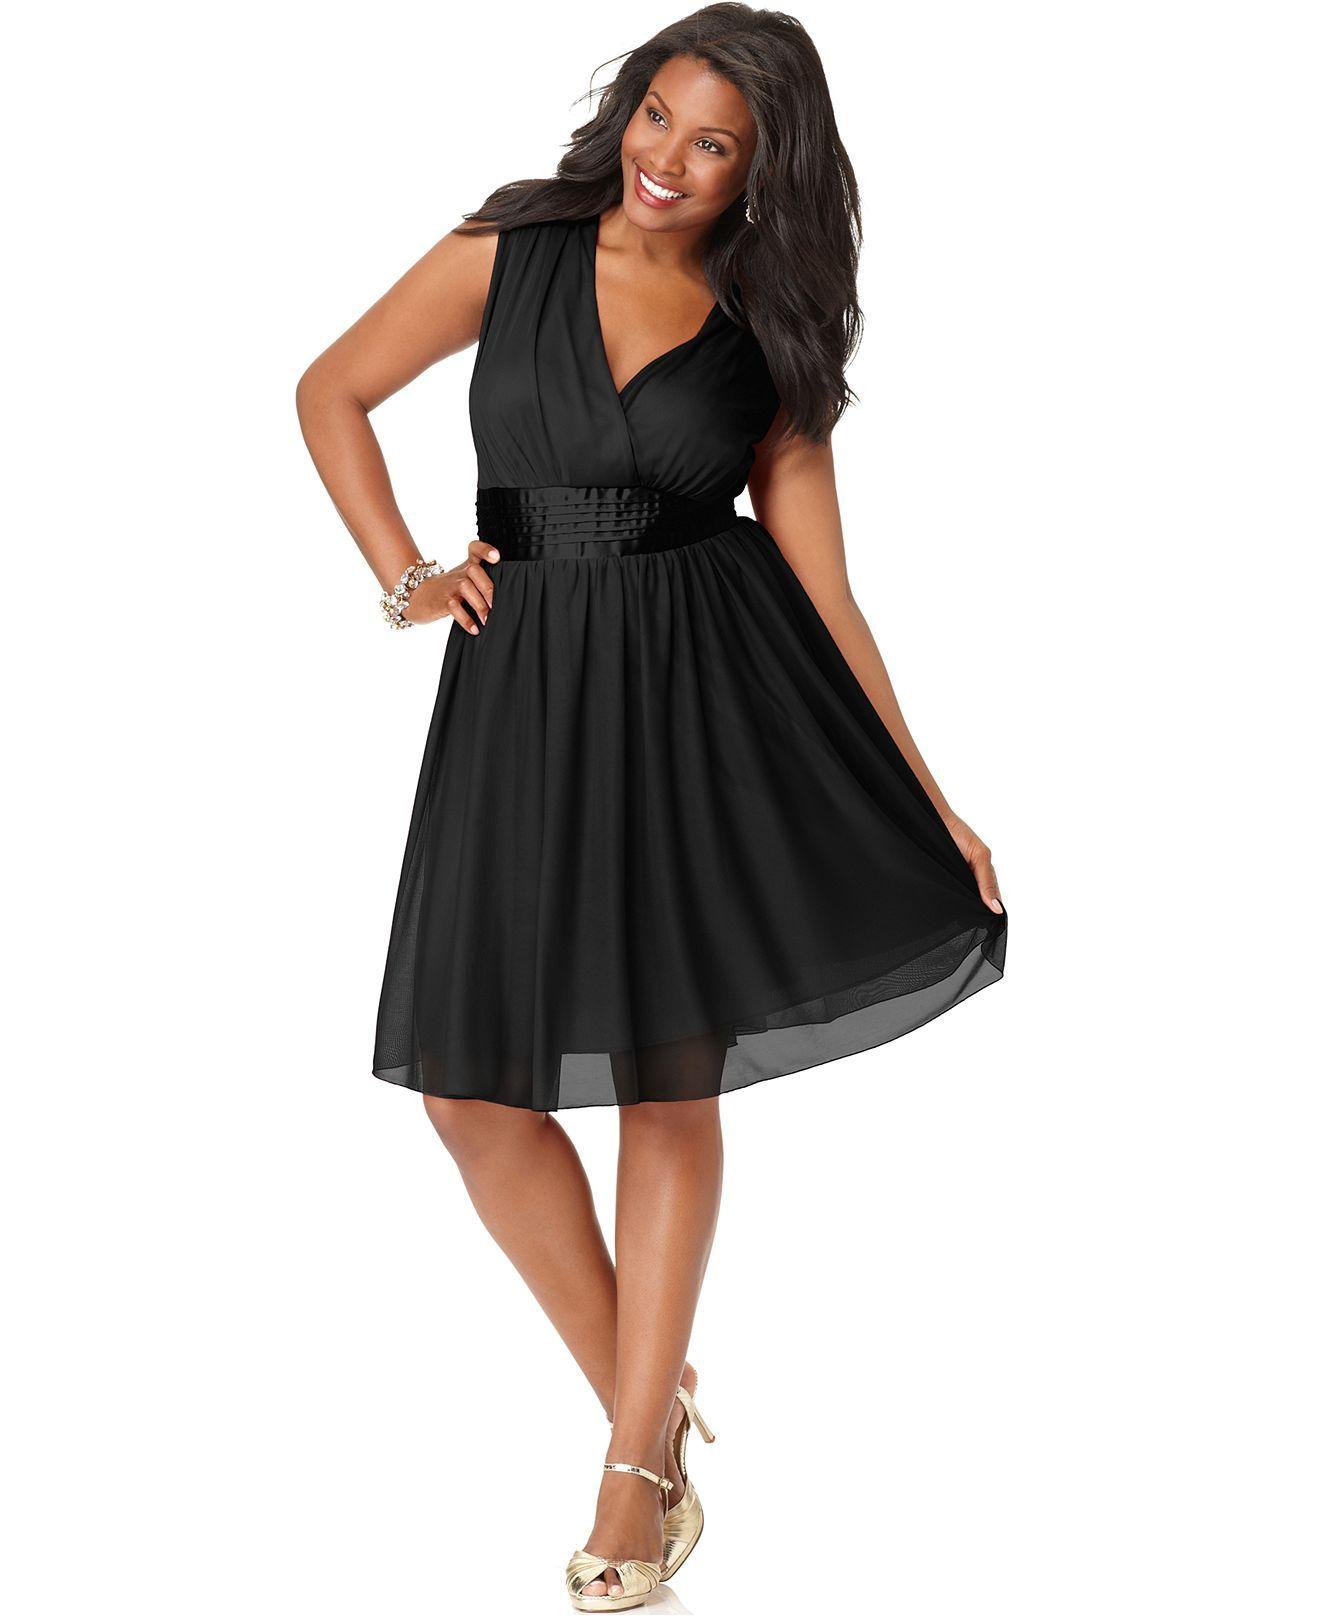 Trixxi Plus Size Prom Dress, Sleeveless Banded Empire A